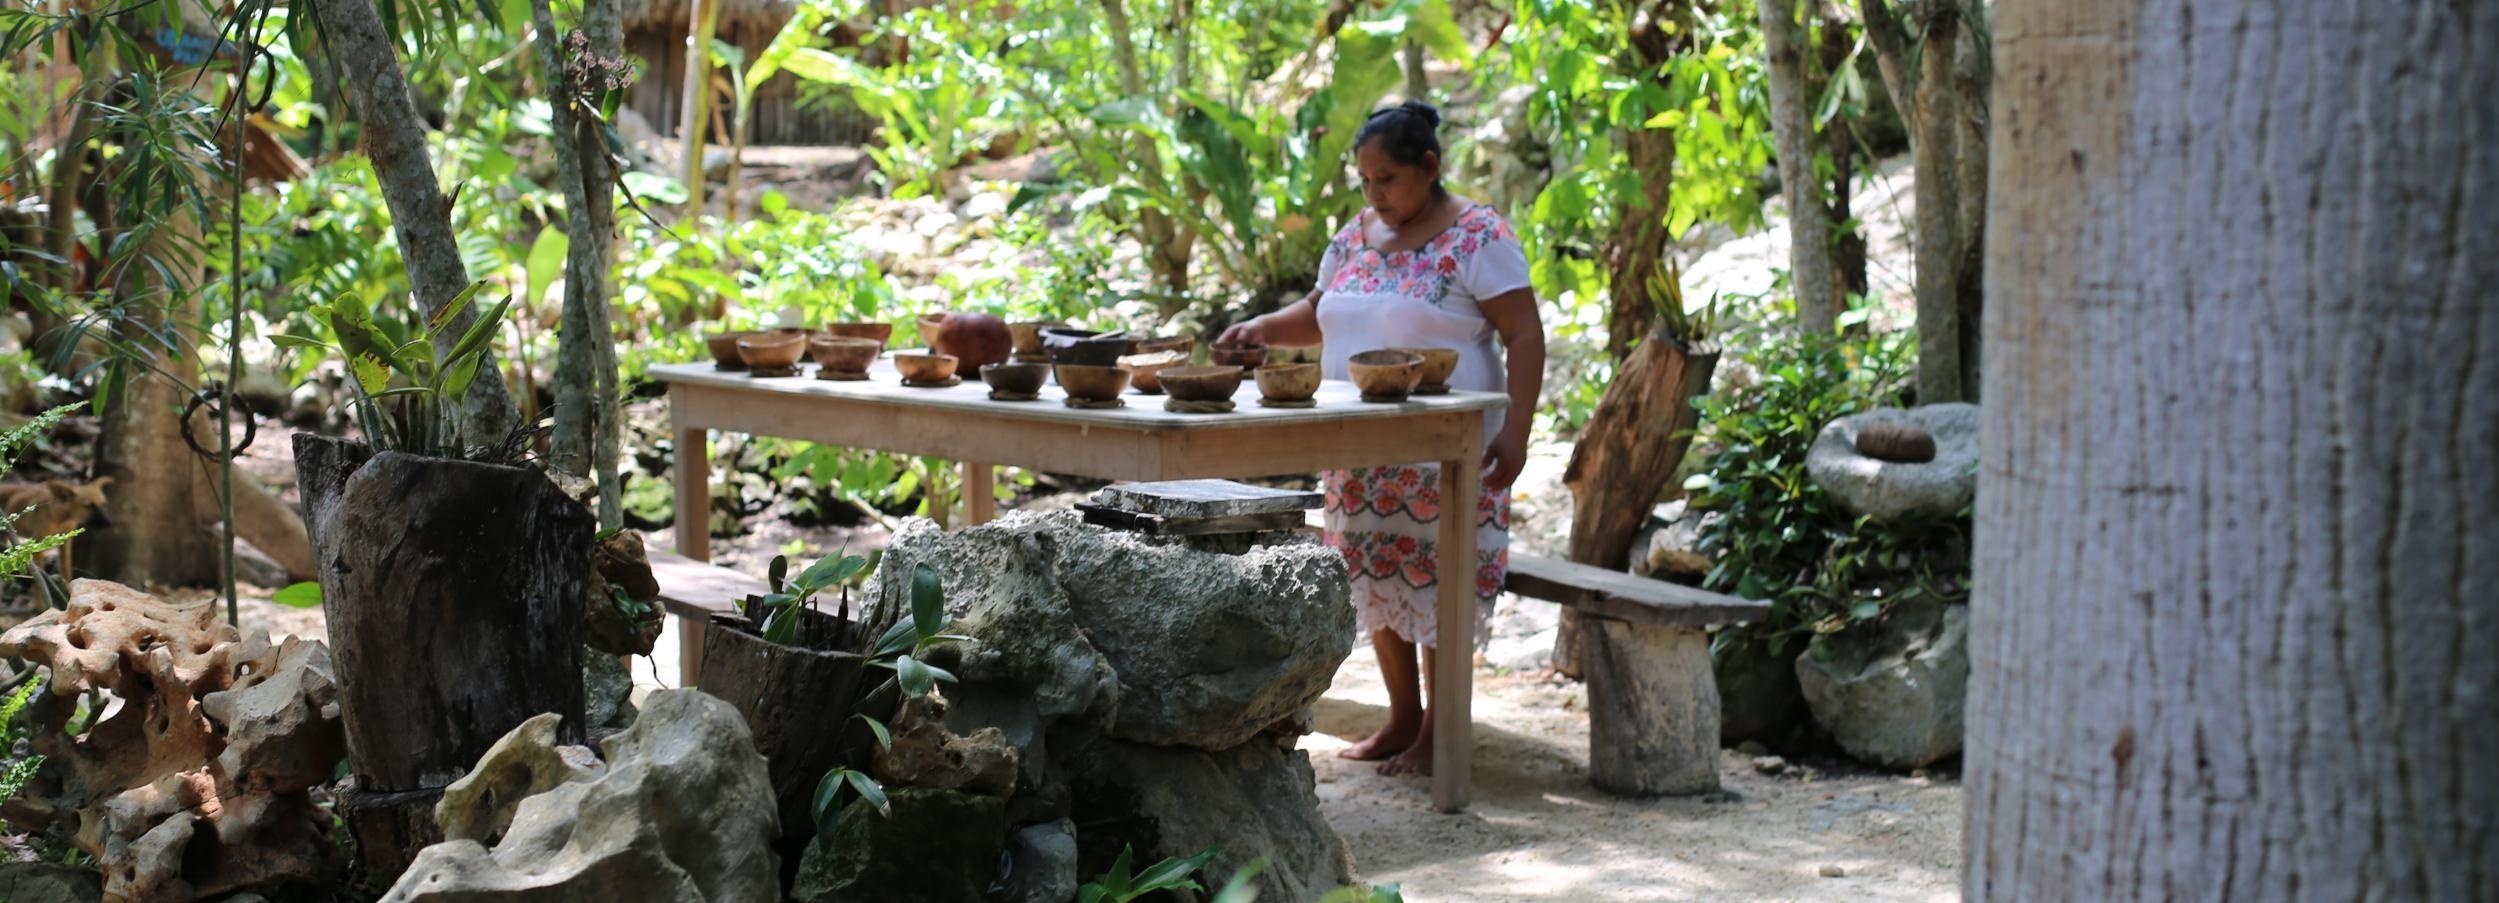 Caminos Mayas: Tour en bicicleta